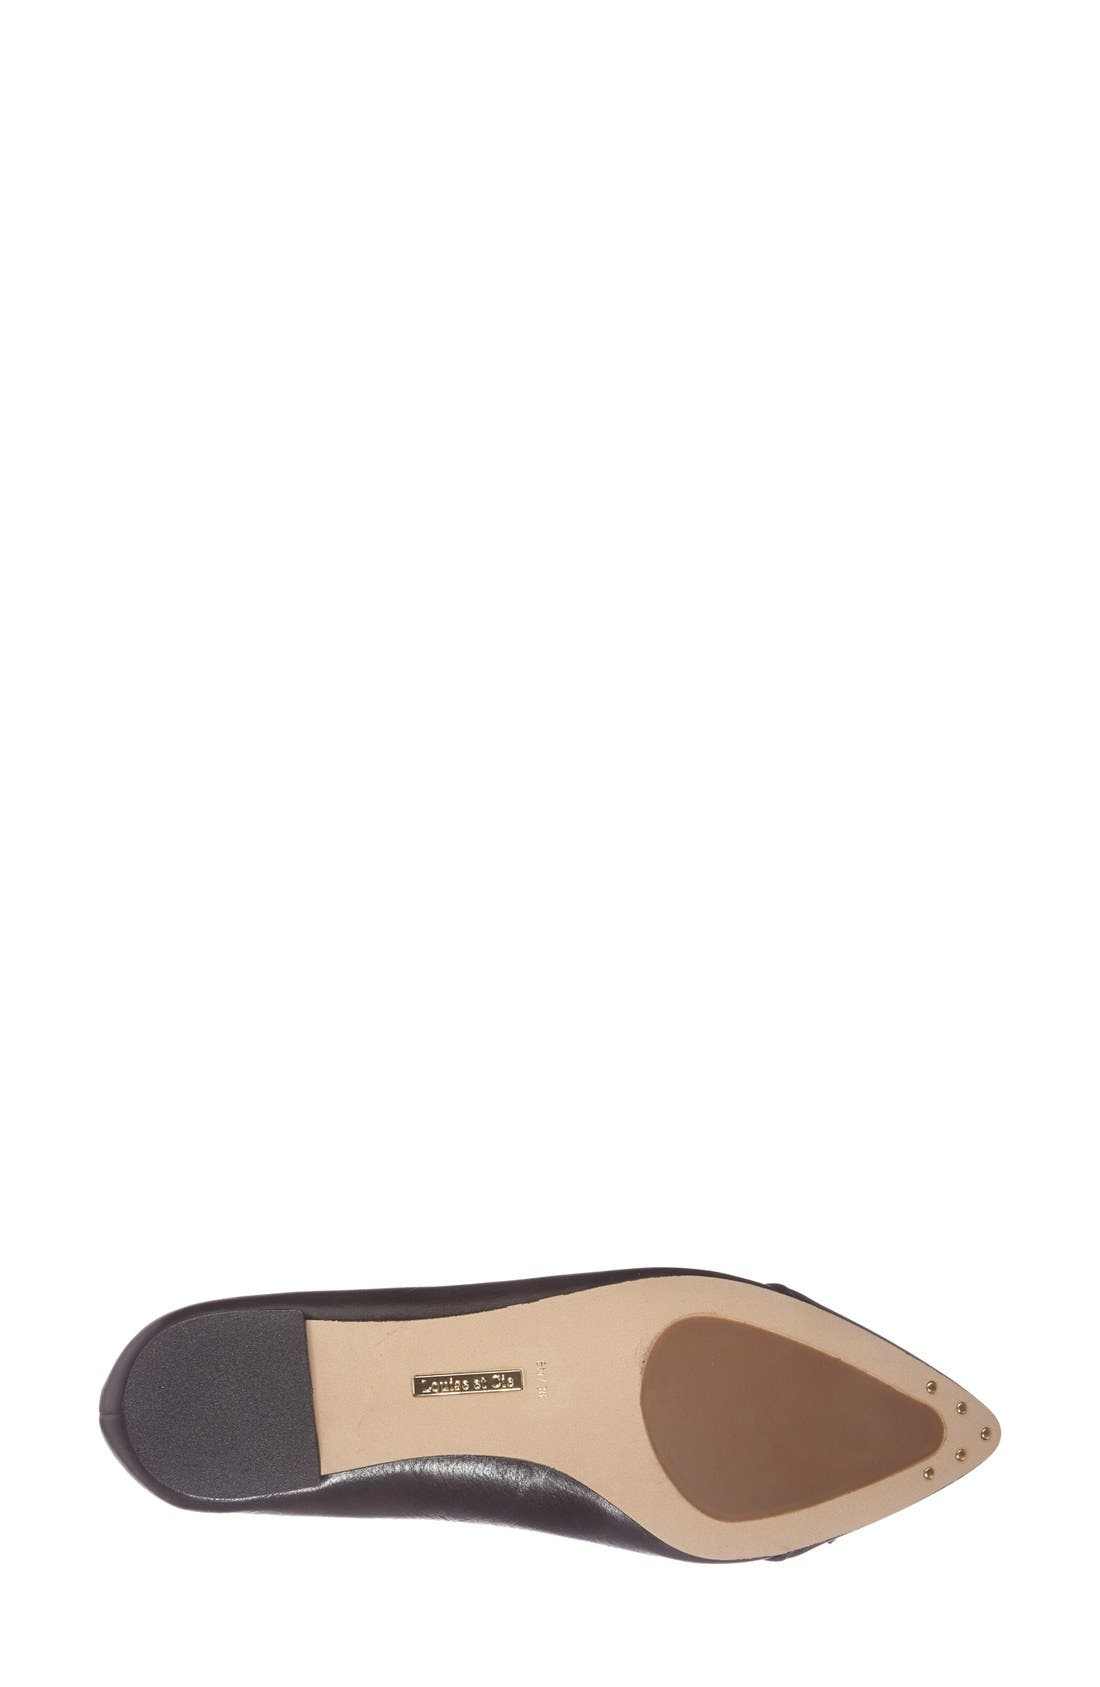 Alternate Image 4  - Louise et Cie 'Baylee' Tassel Pointy Toe Loafer (Women)